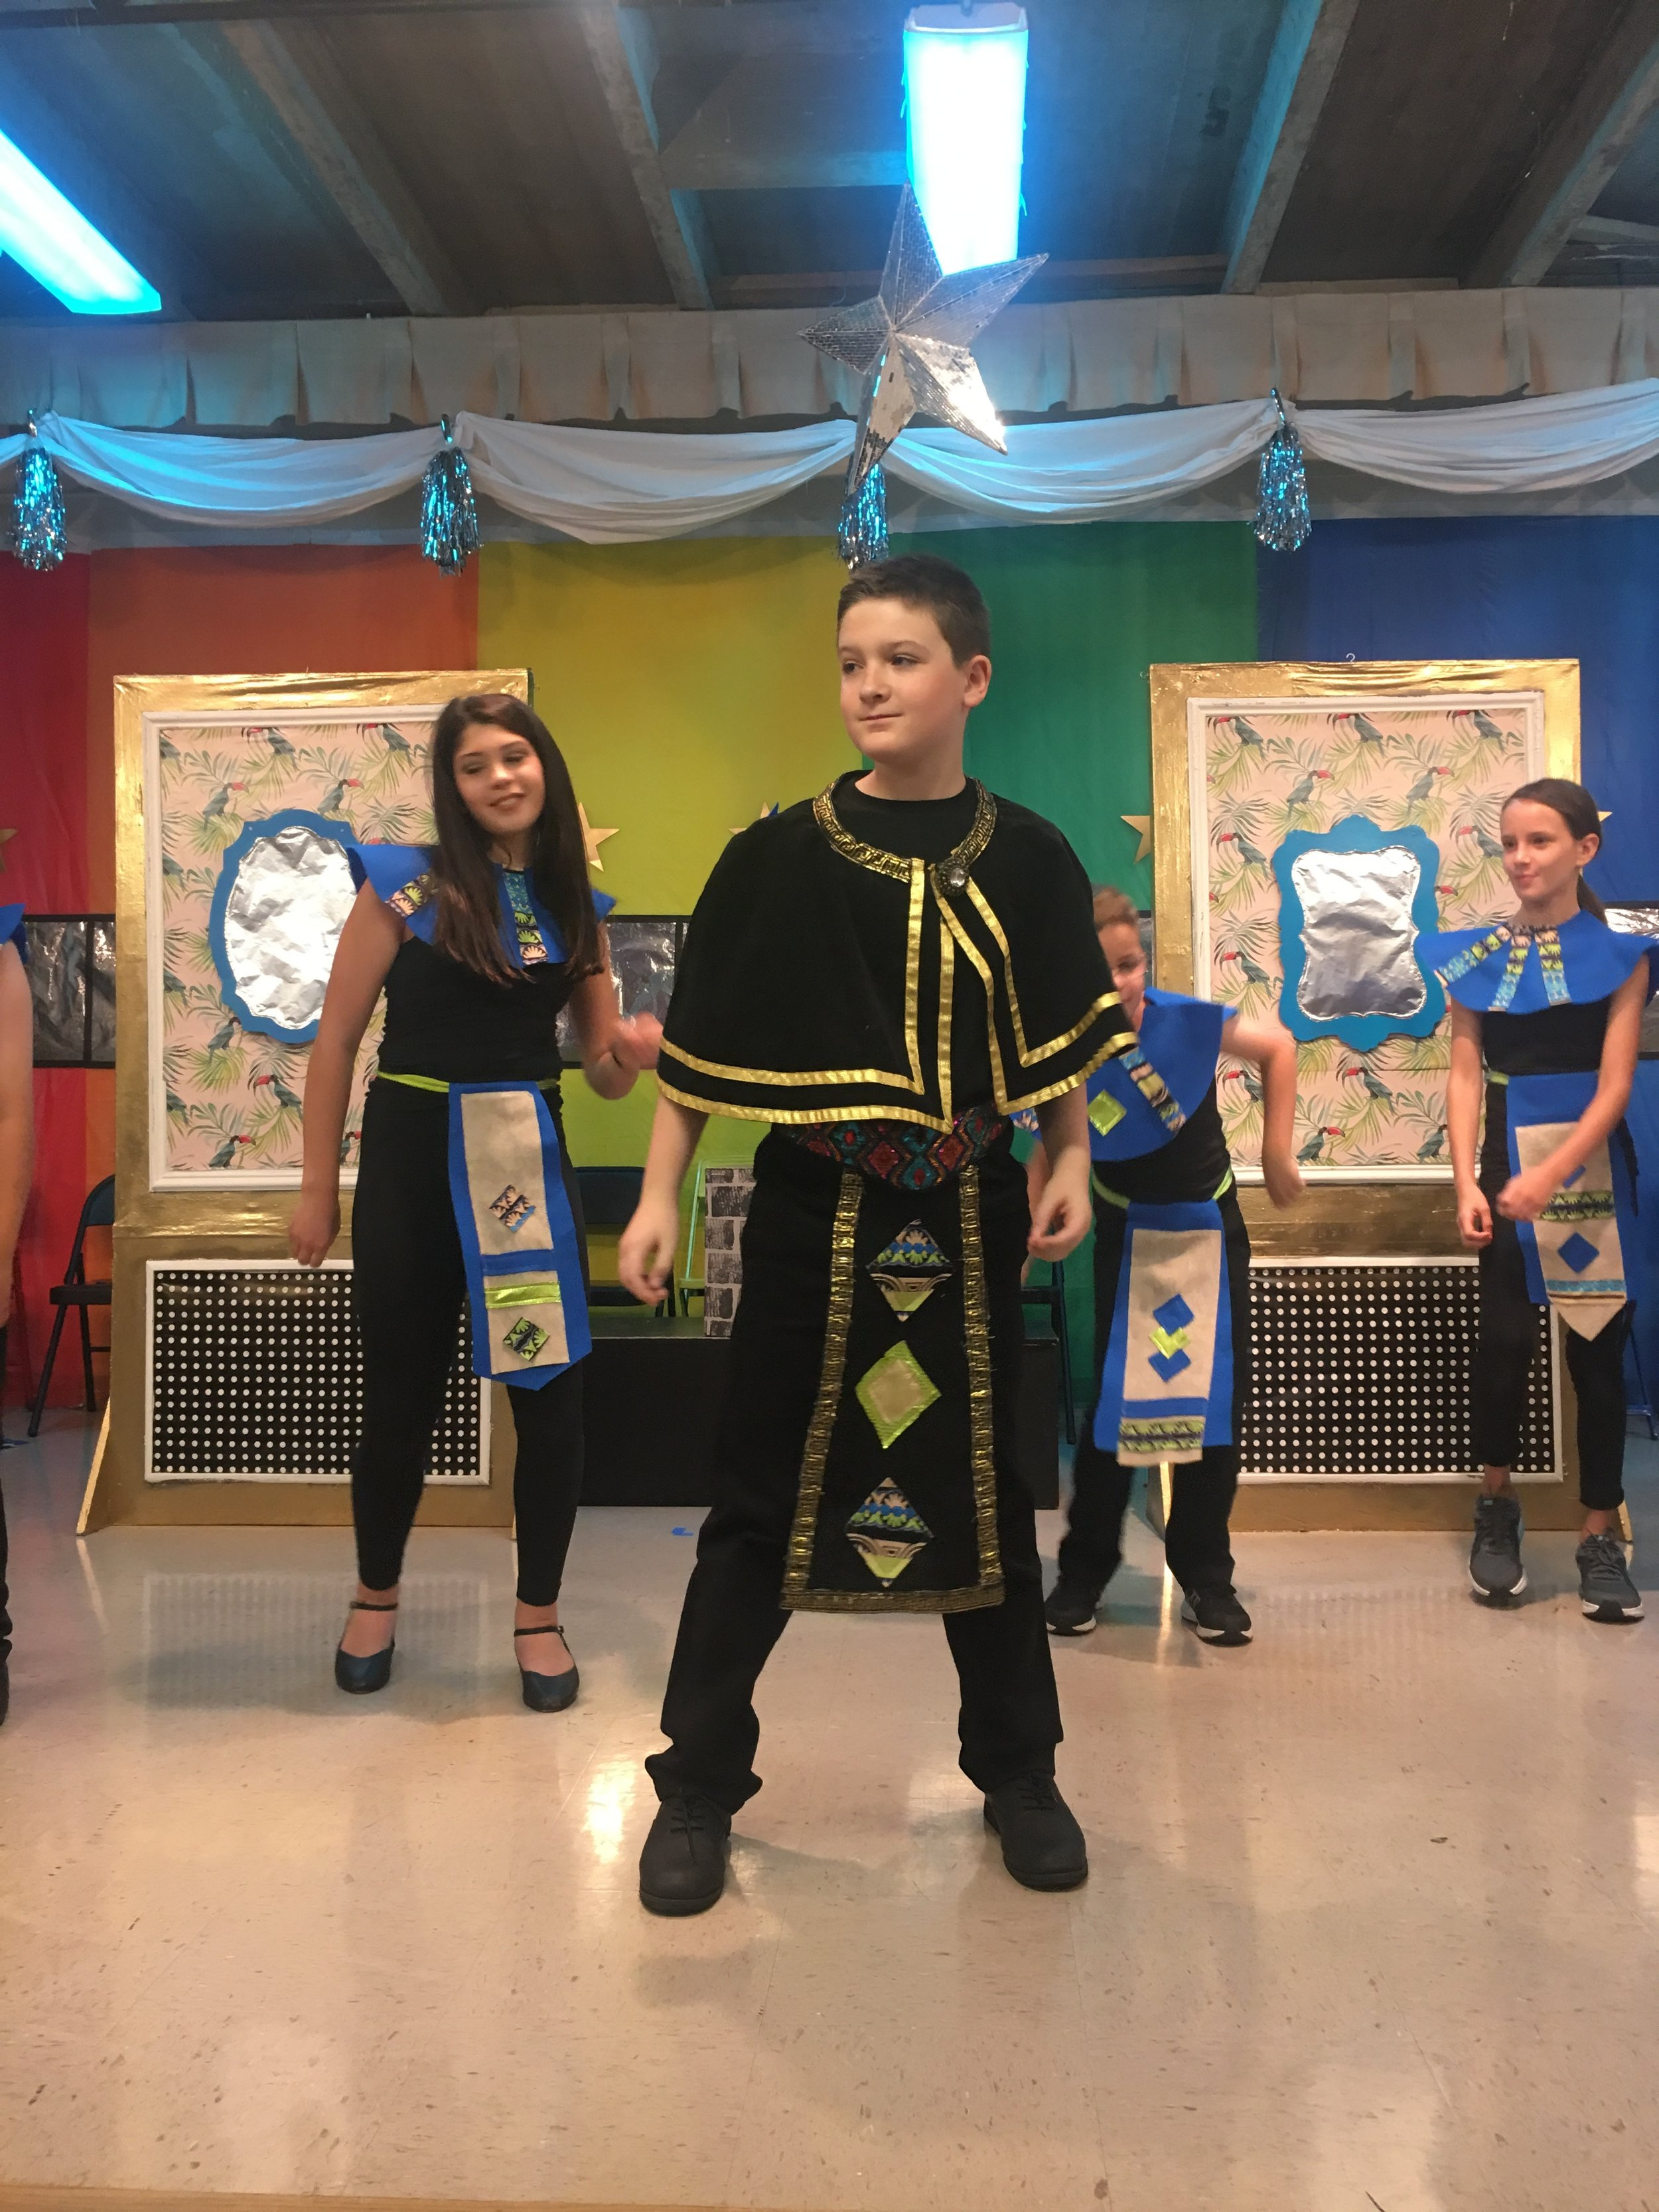 Joseph and the Amazing Technicolor Dreamcoat - Summer 2018